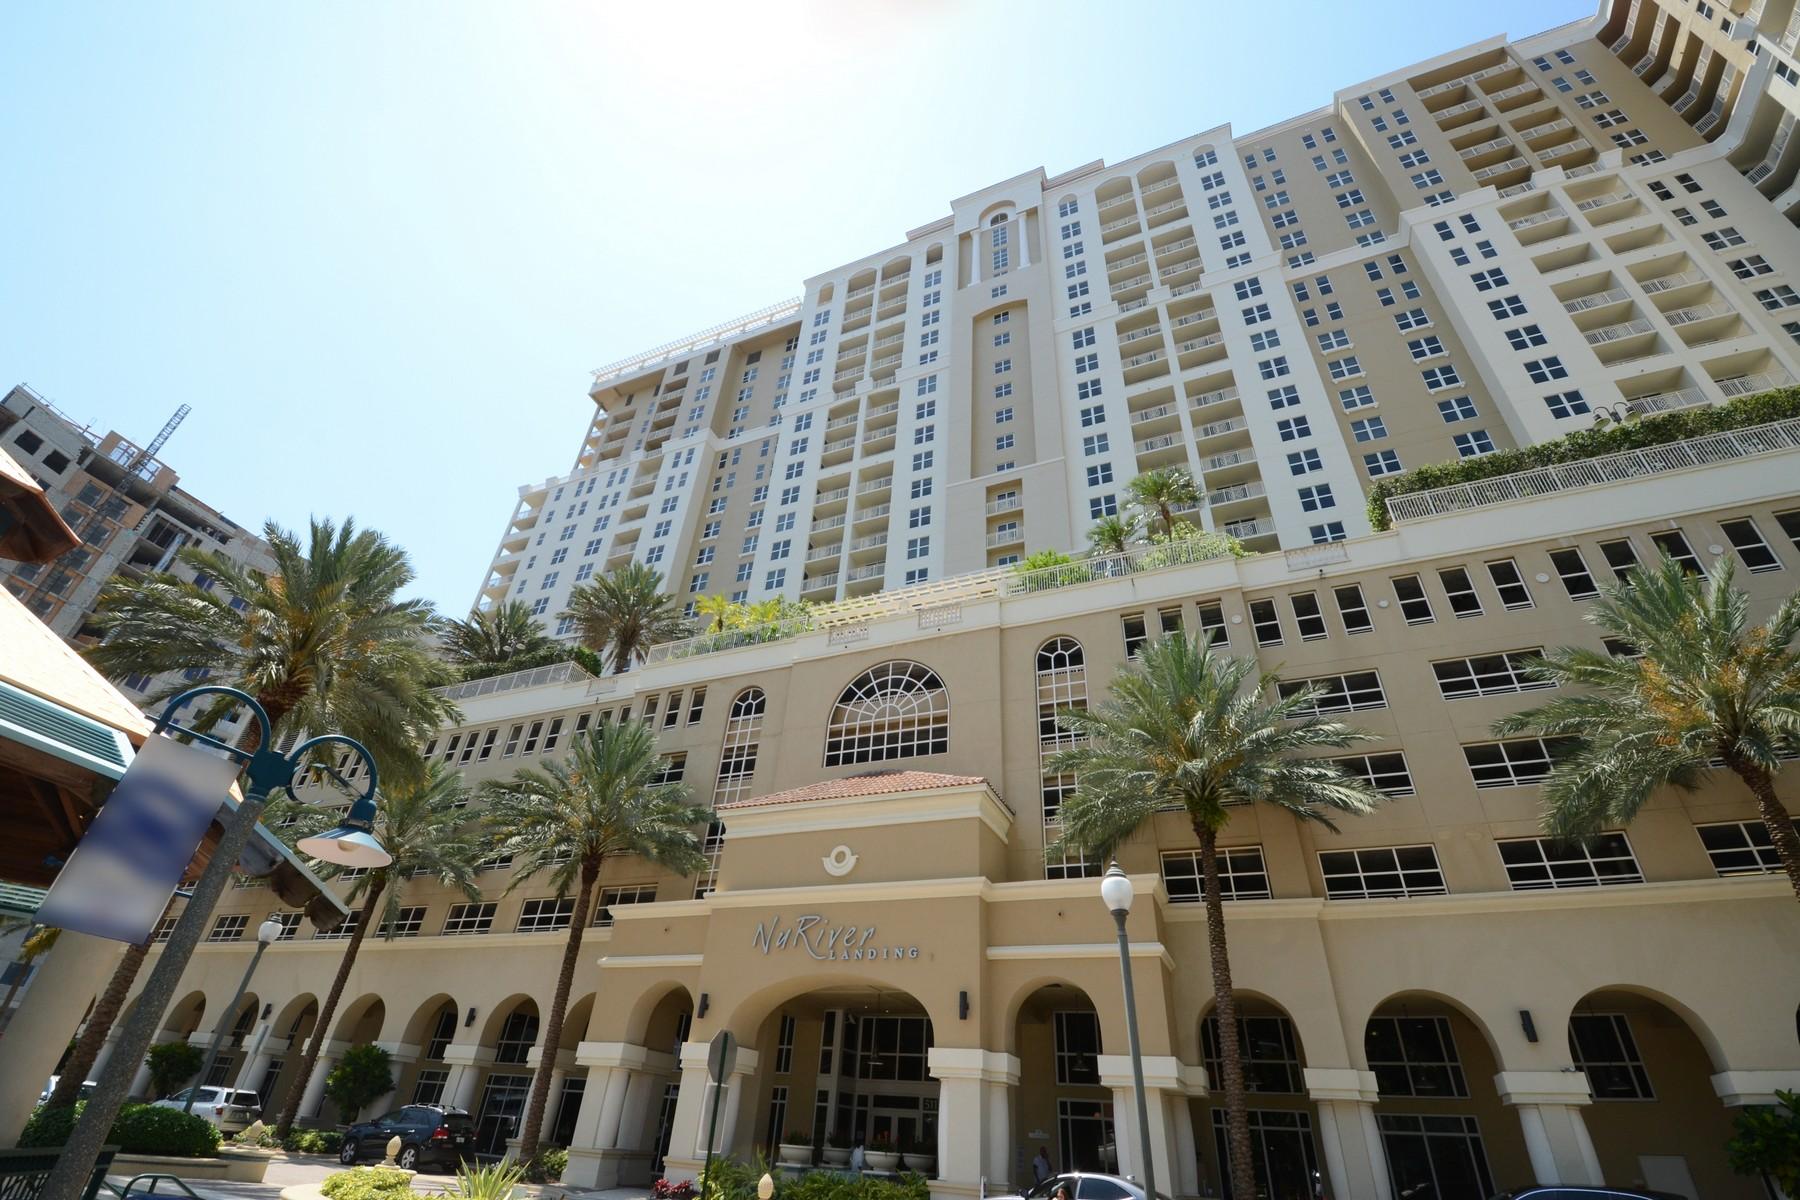 Condominium for Sale at Nu River Landing 511 SE 5th Ave. #605 Fort Lauderdale, Florida 33301 United States